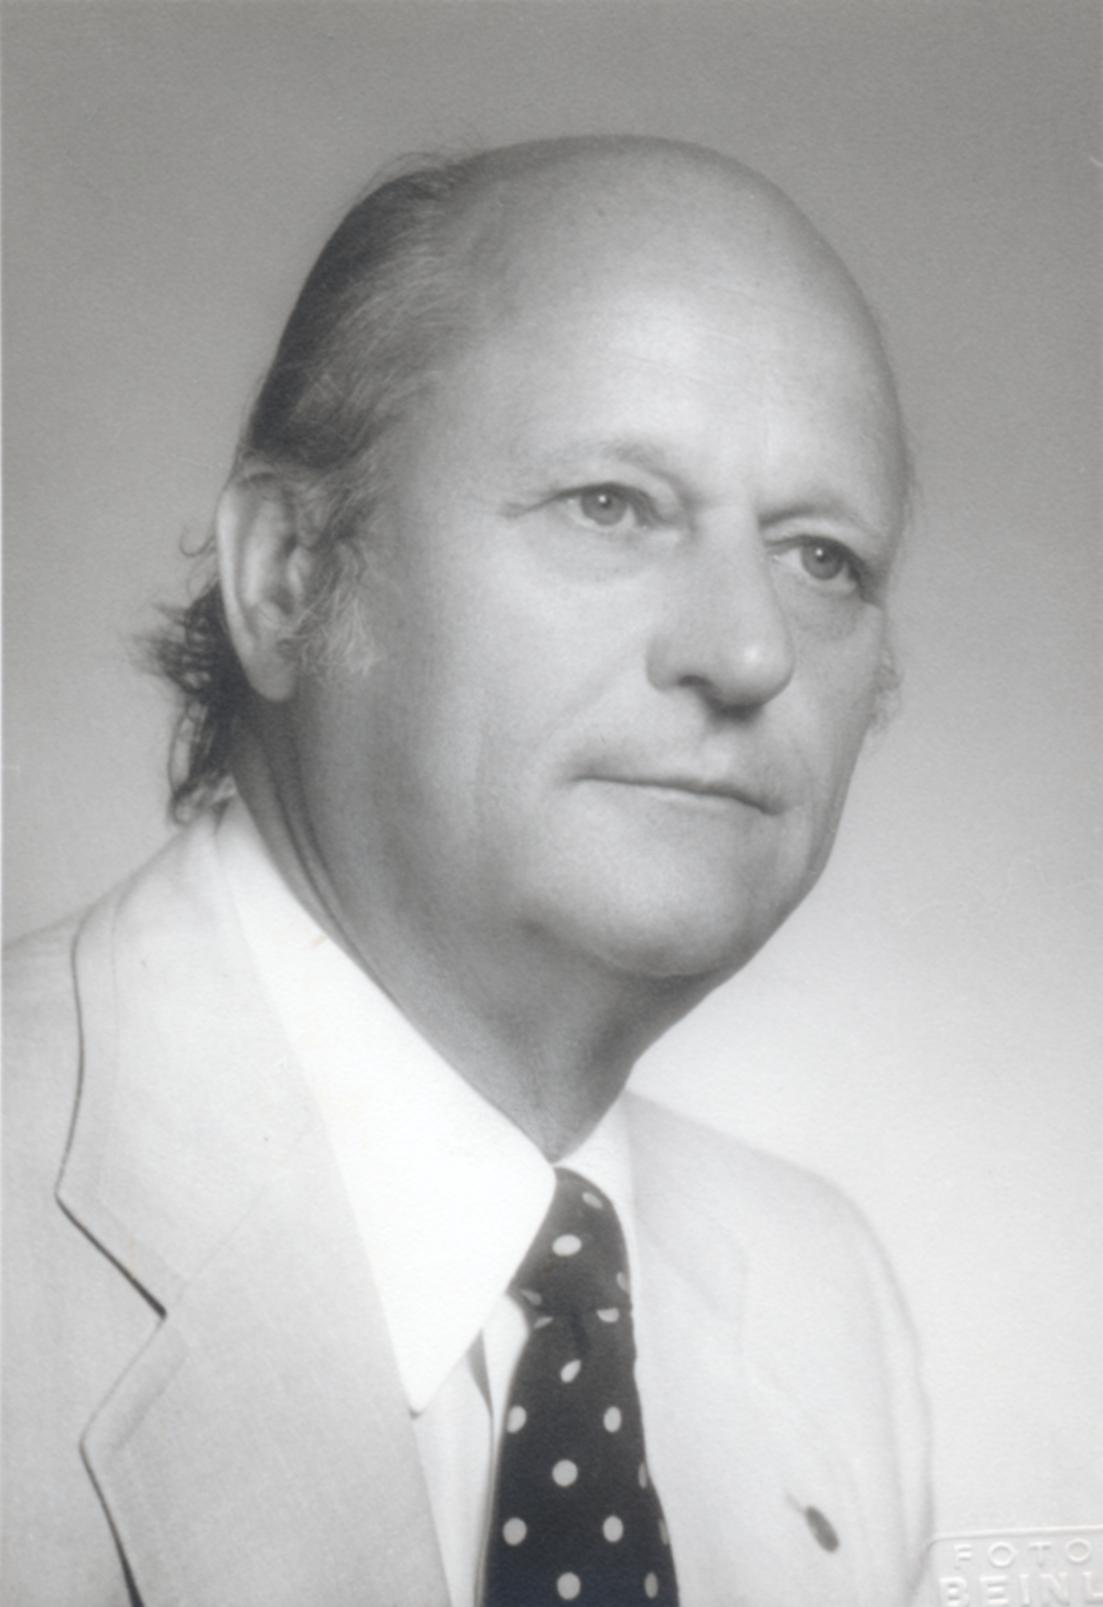 IX. Imago Mundi-Kongress 1982, Innsbruck, Prof. Dr. Hellmut Hofmann